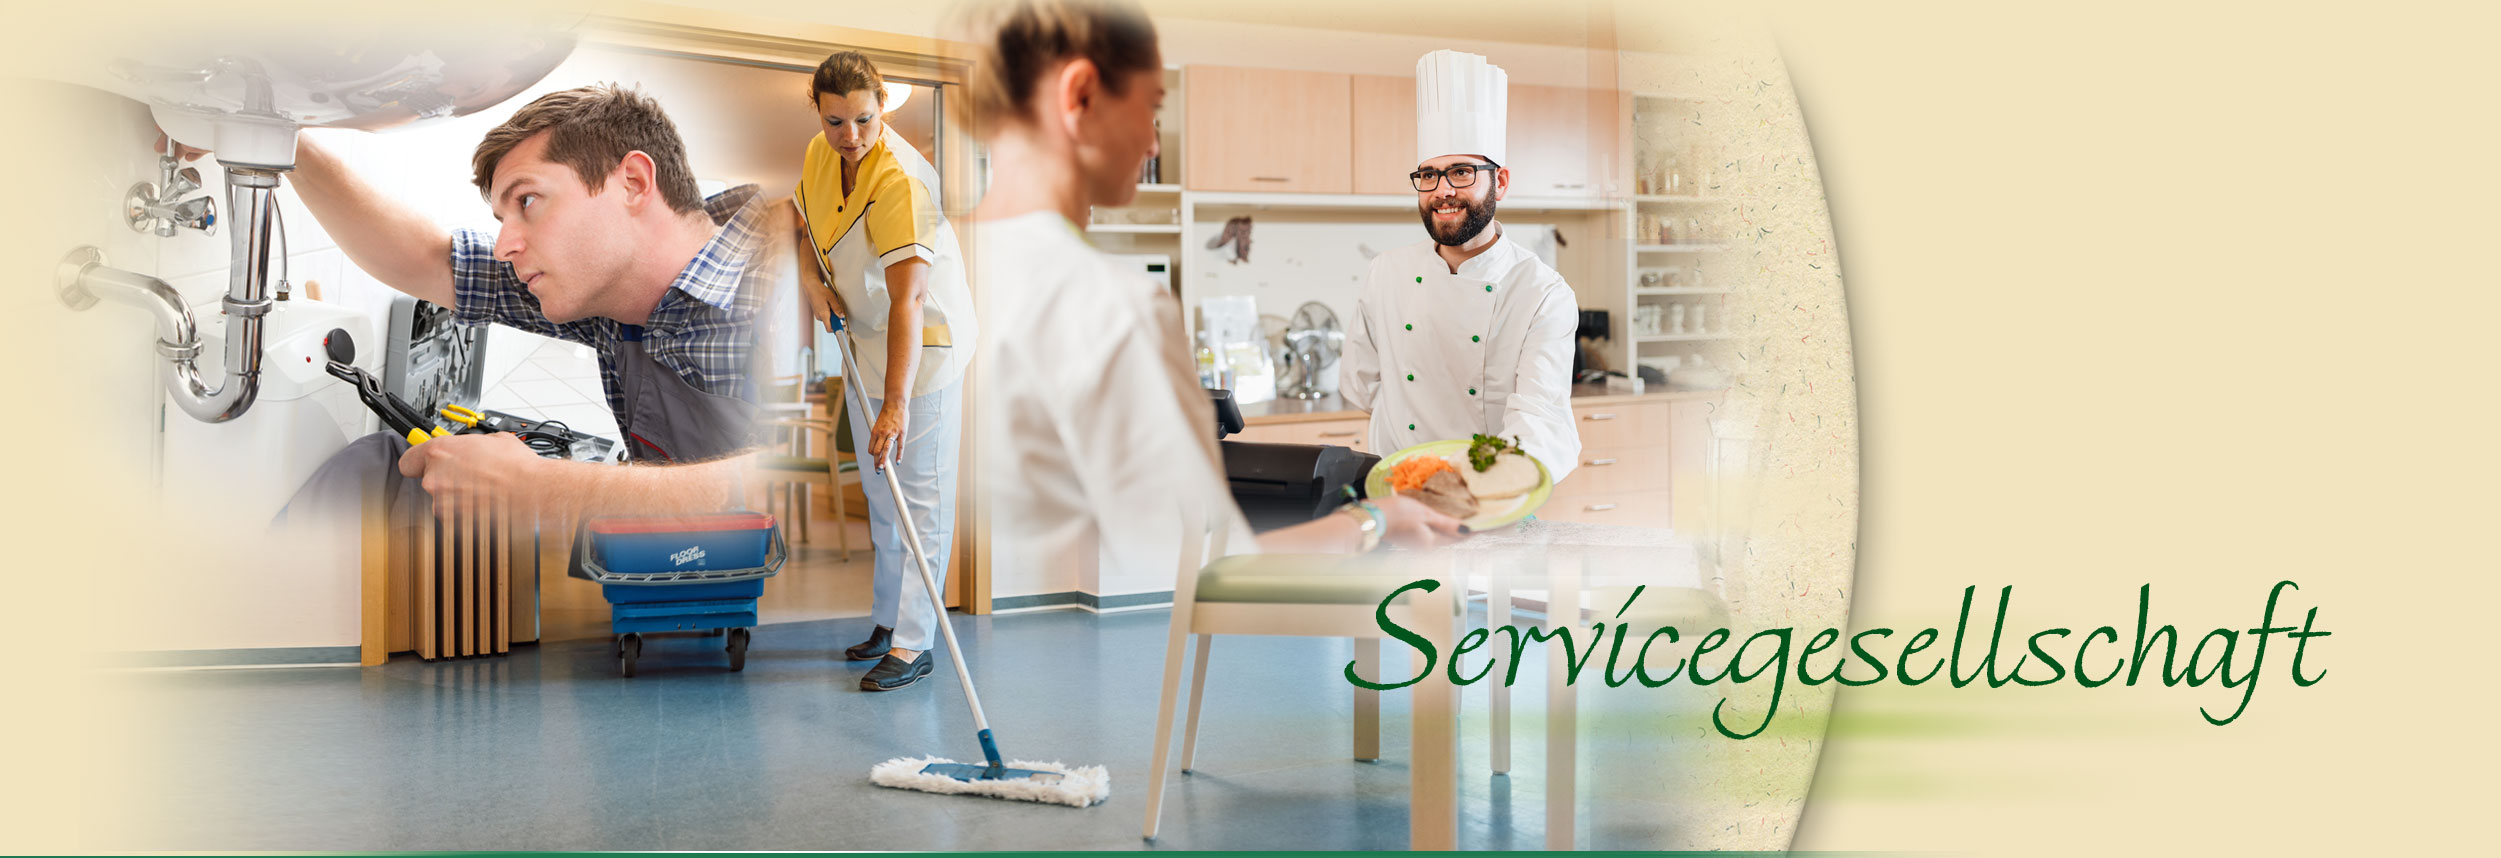 Servicegesellschaft der Seniorenheim Freiberg gGmbH